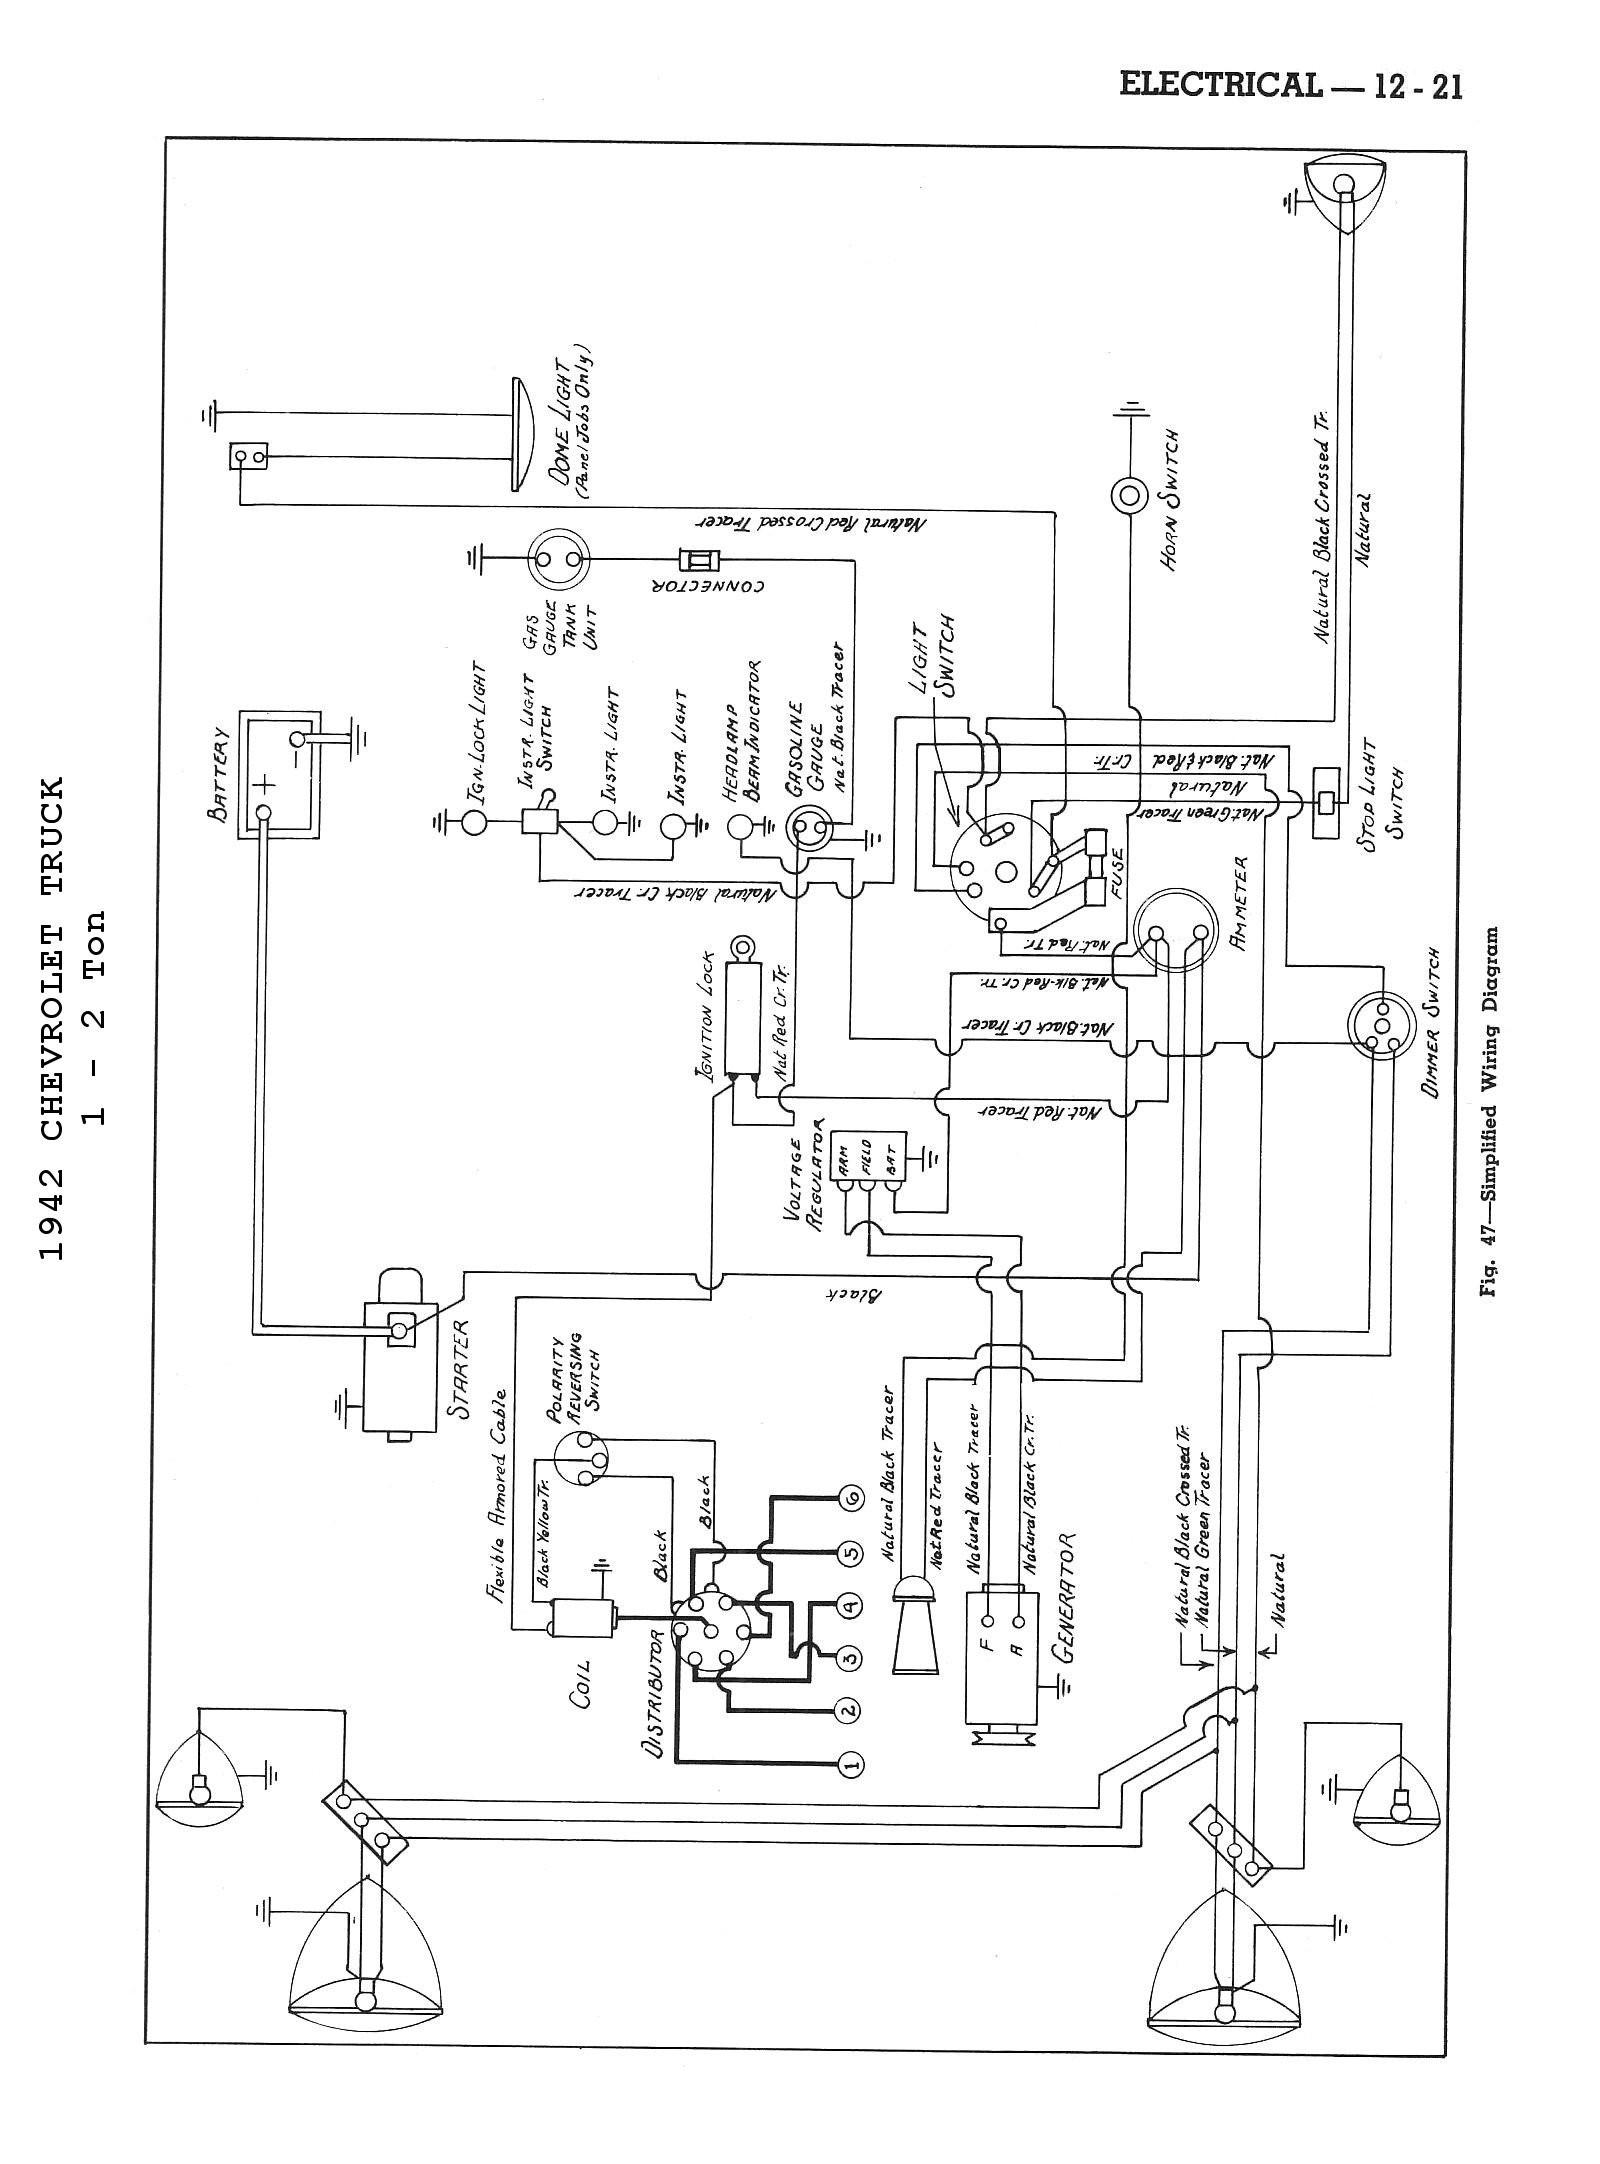 alternator wiring diagram Collection-Jcb Alternator Wiring Diagram 2018 Turn Signal Wiring Diagram Lovely Jcb 3 0d 4—4 3 5d 4—4 Teletruk 8-e